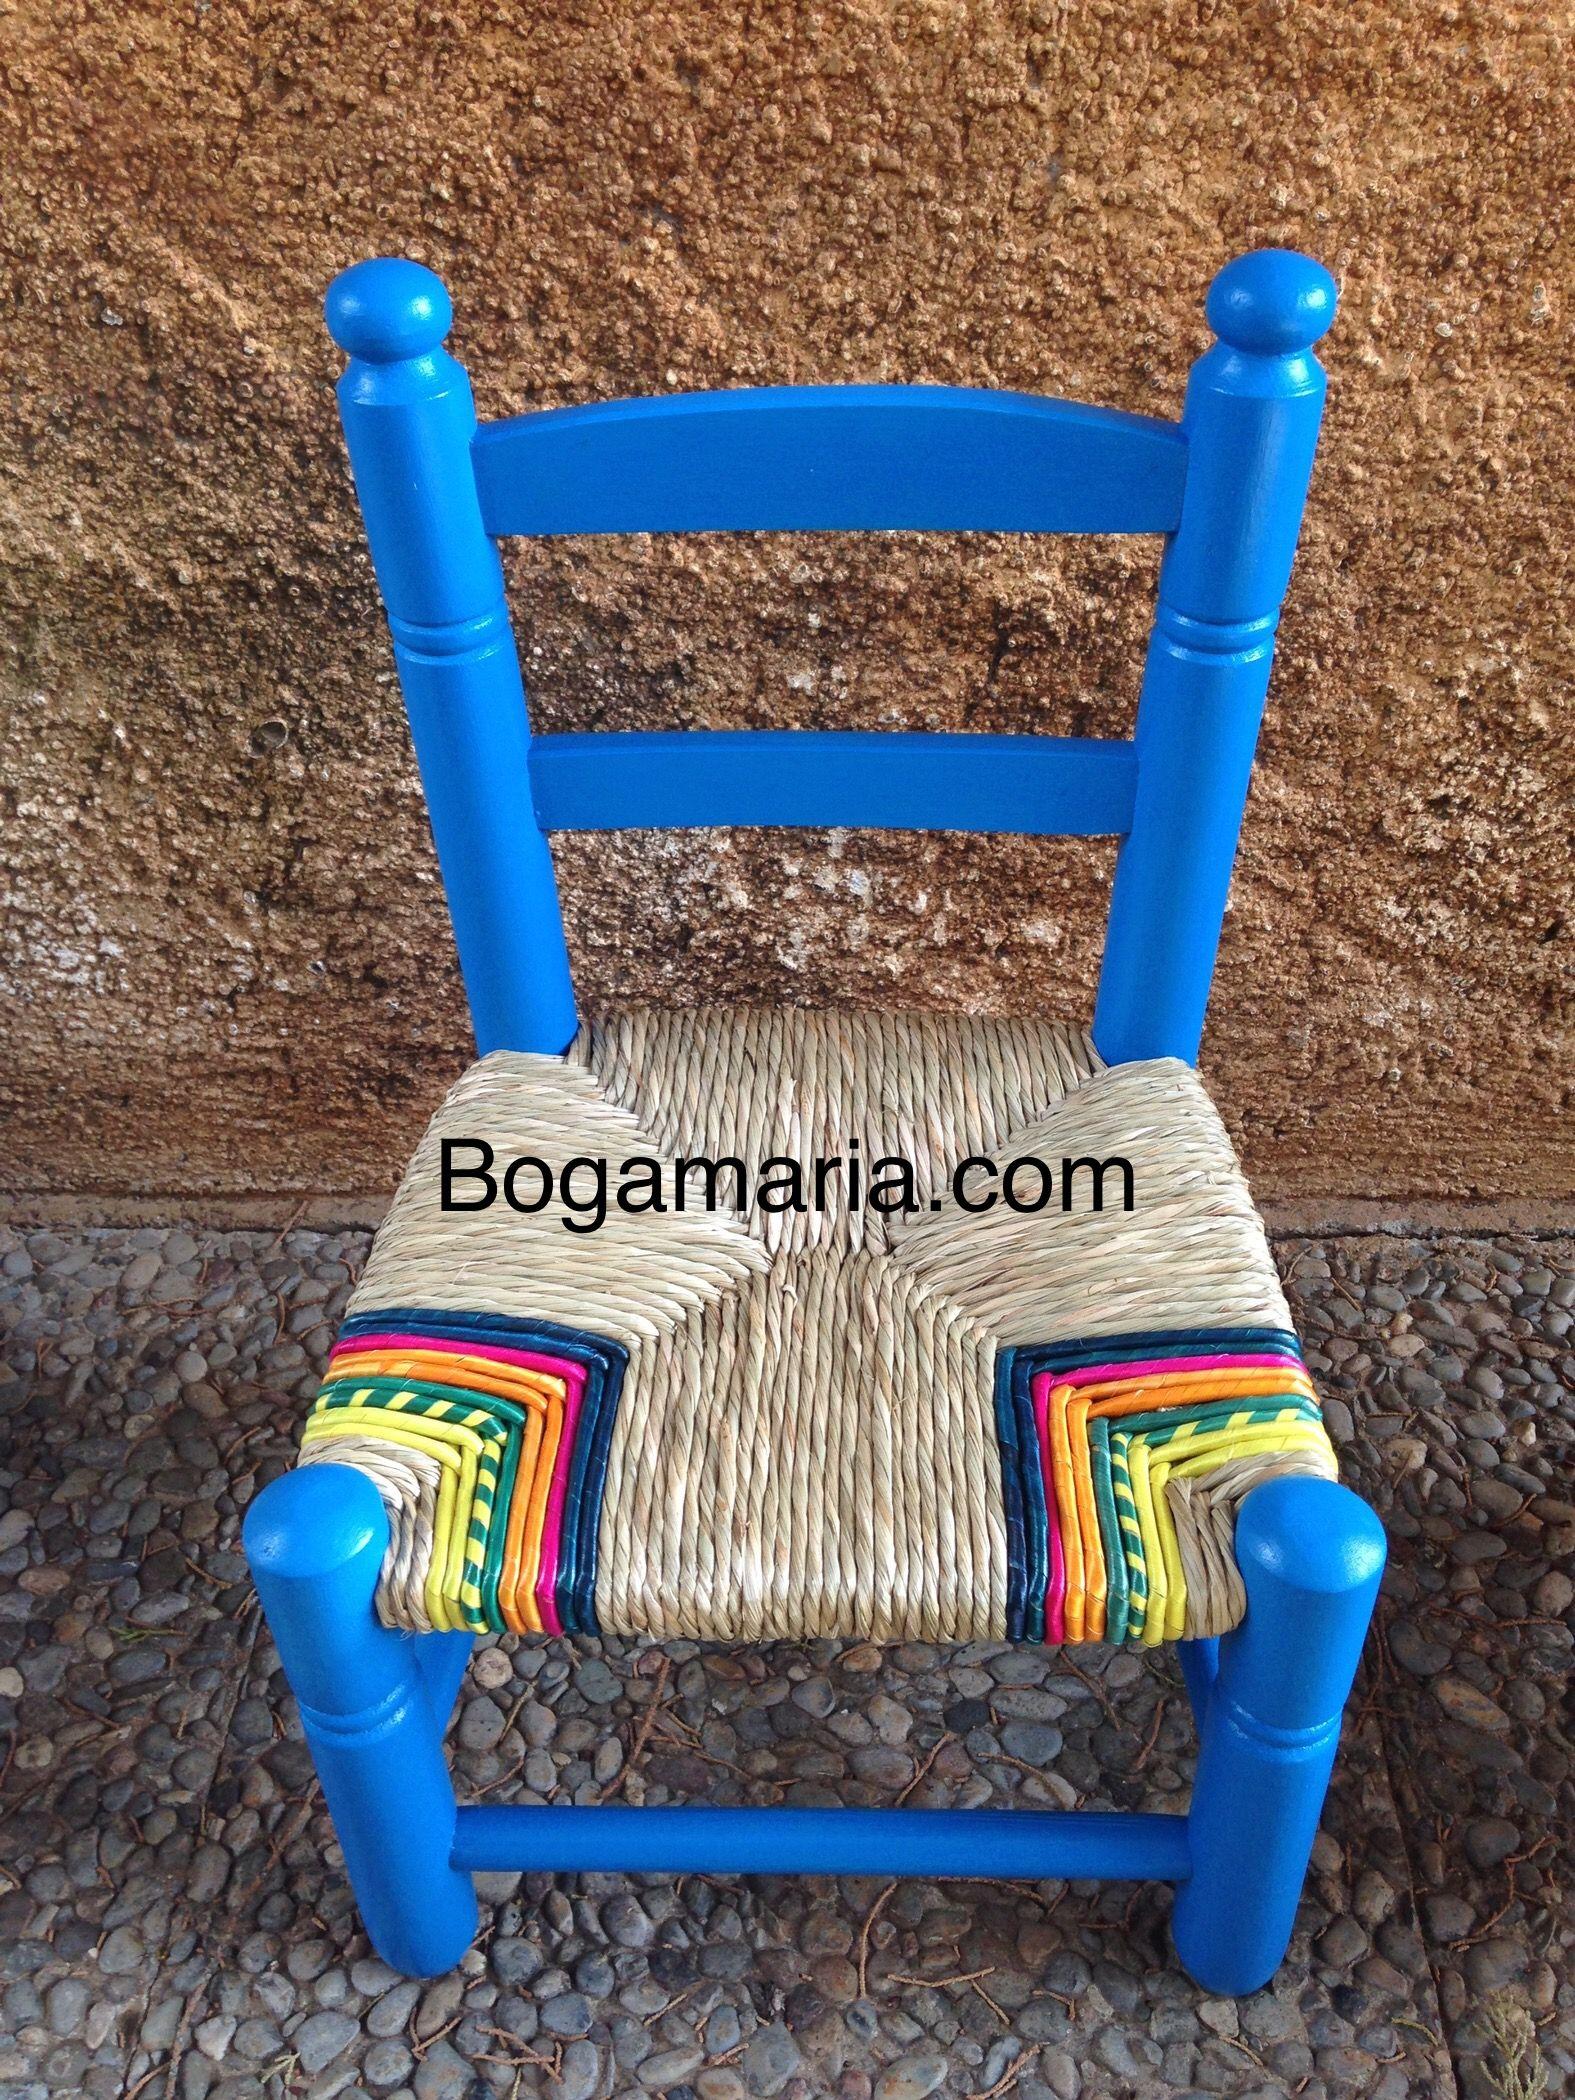 weaving chair straw silla enea infantil rempaillage chaise